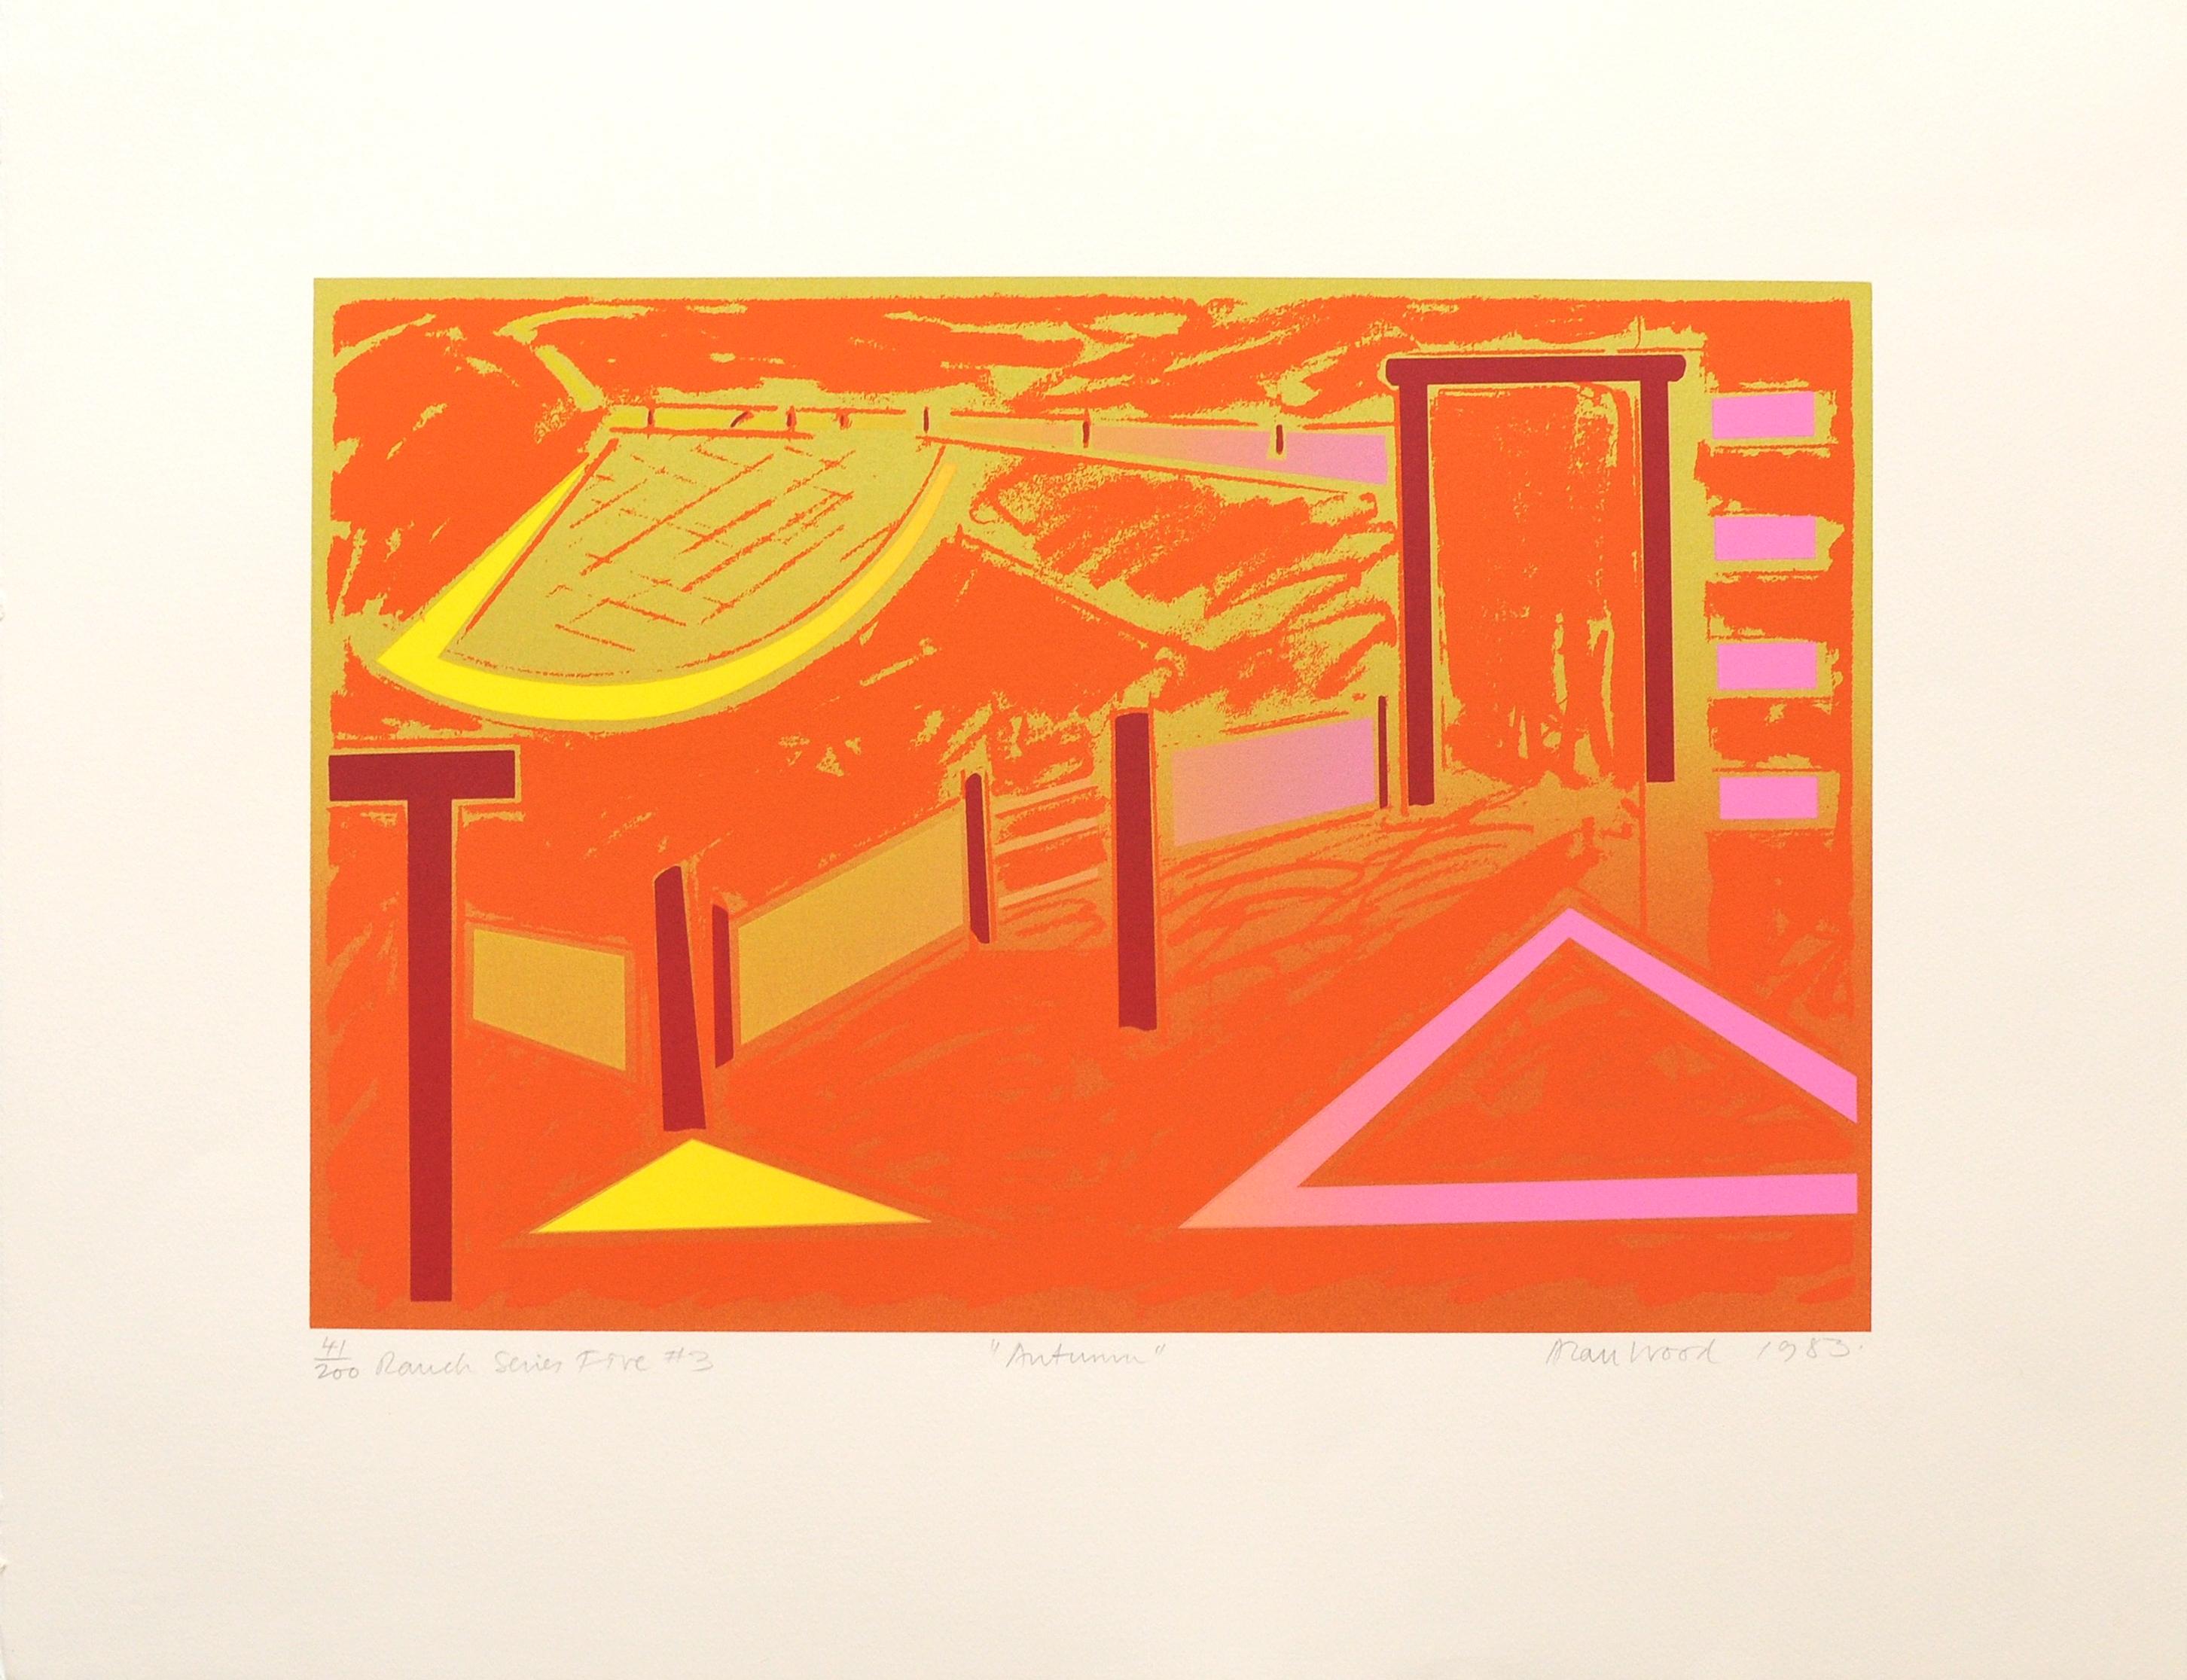 Alan_Woods_1983_Prints_#41_RanchSeriesFive#3_Autumn